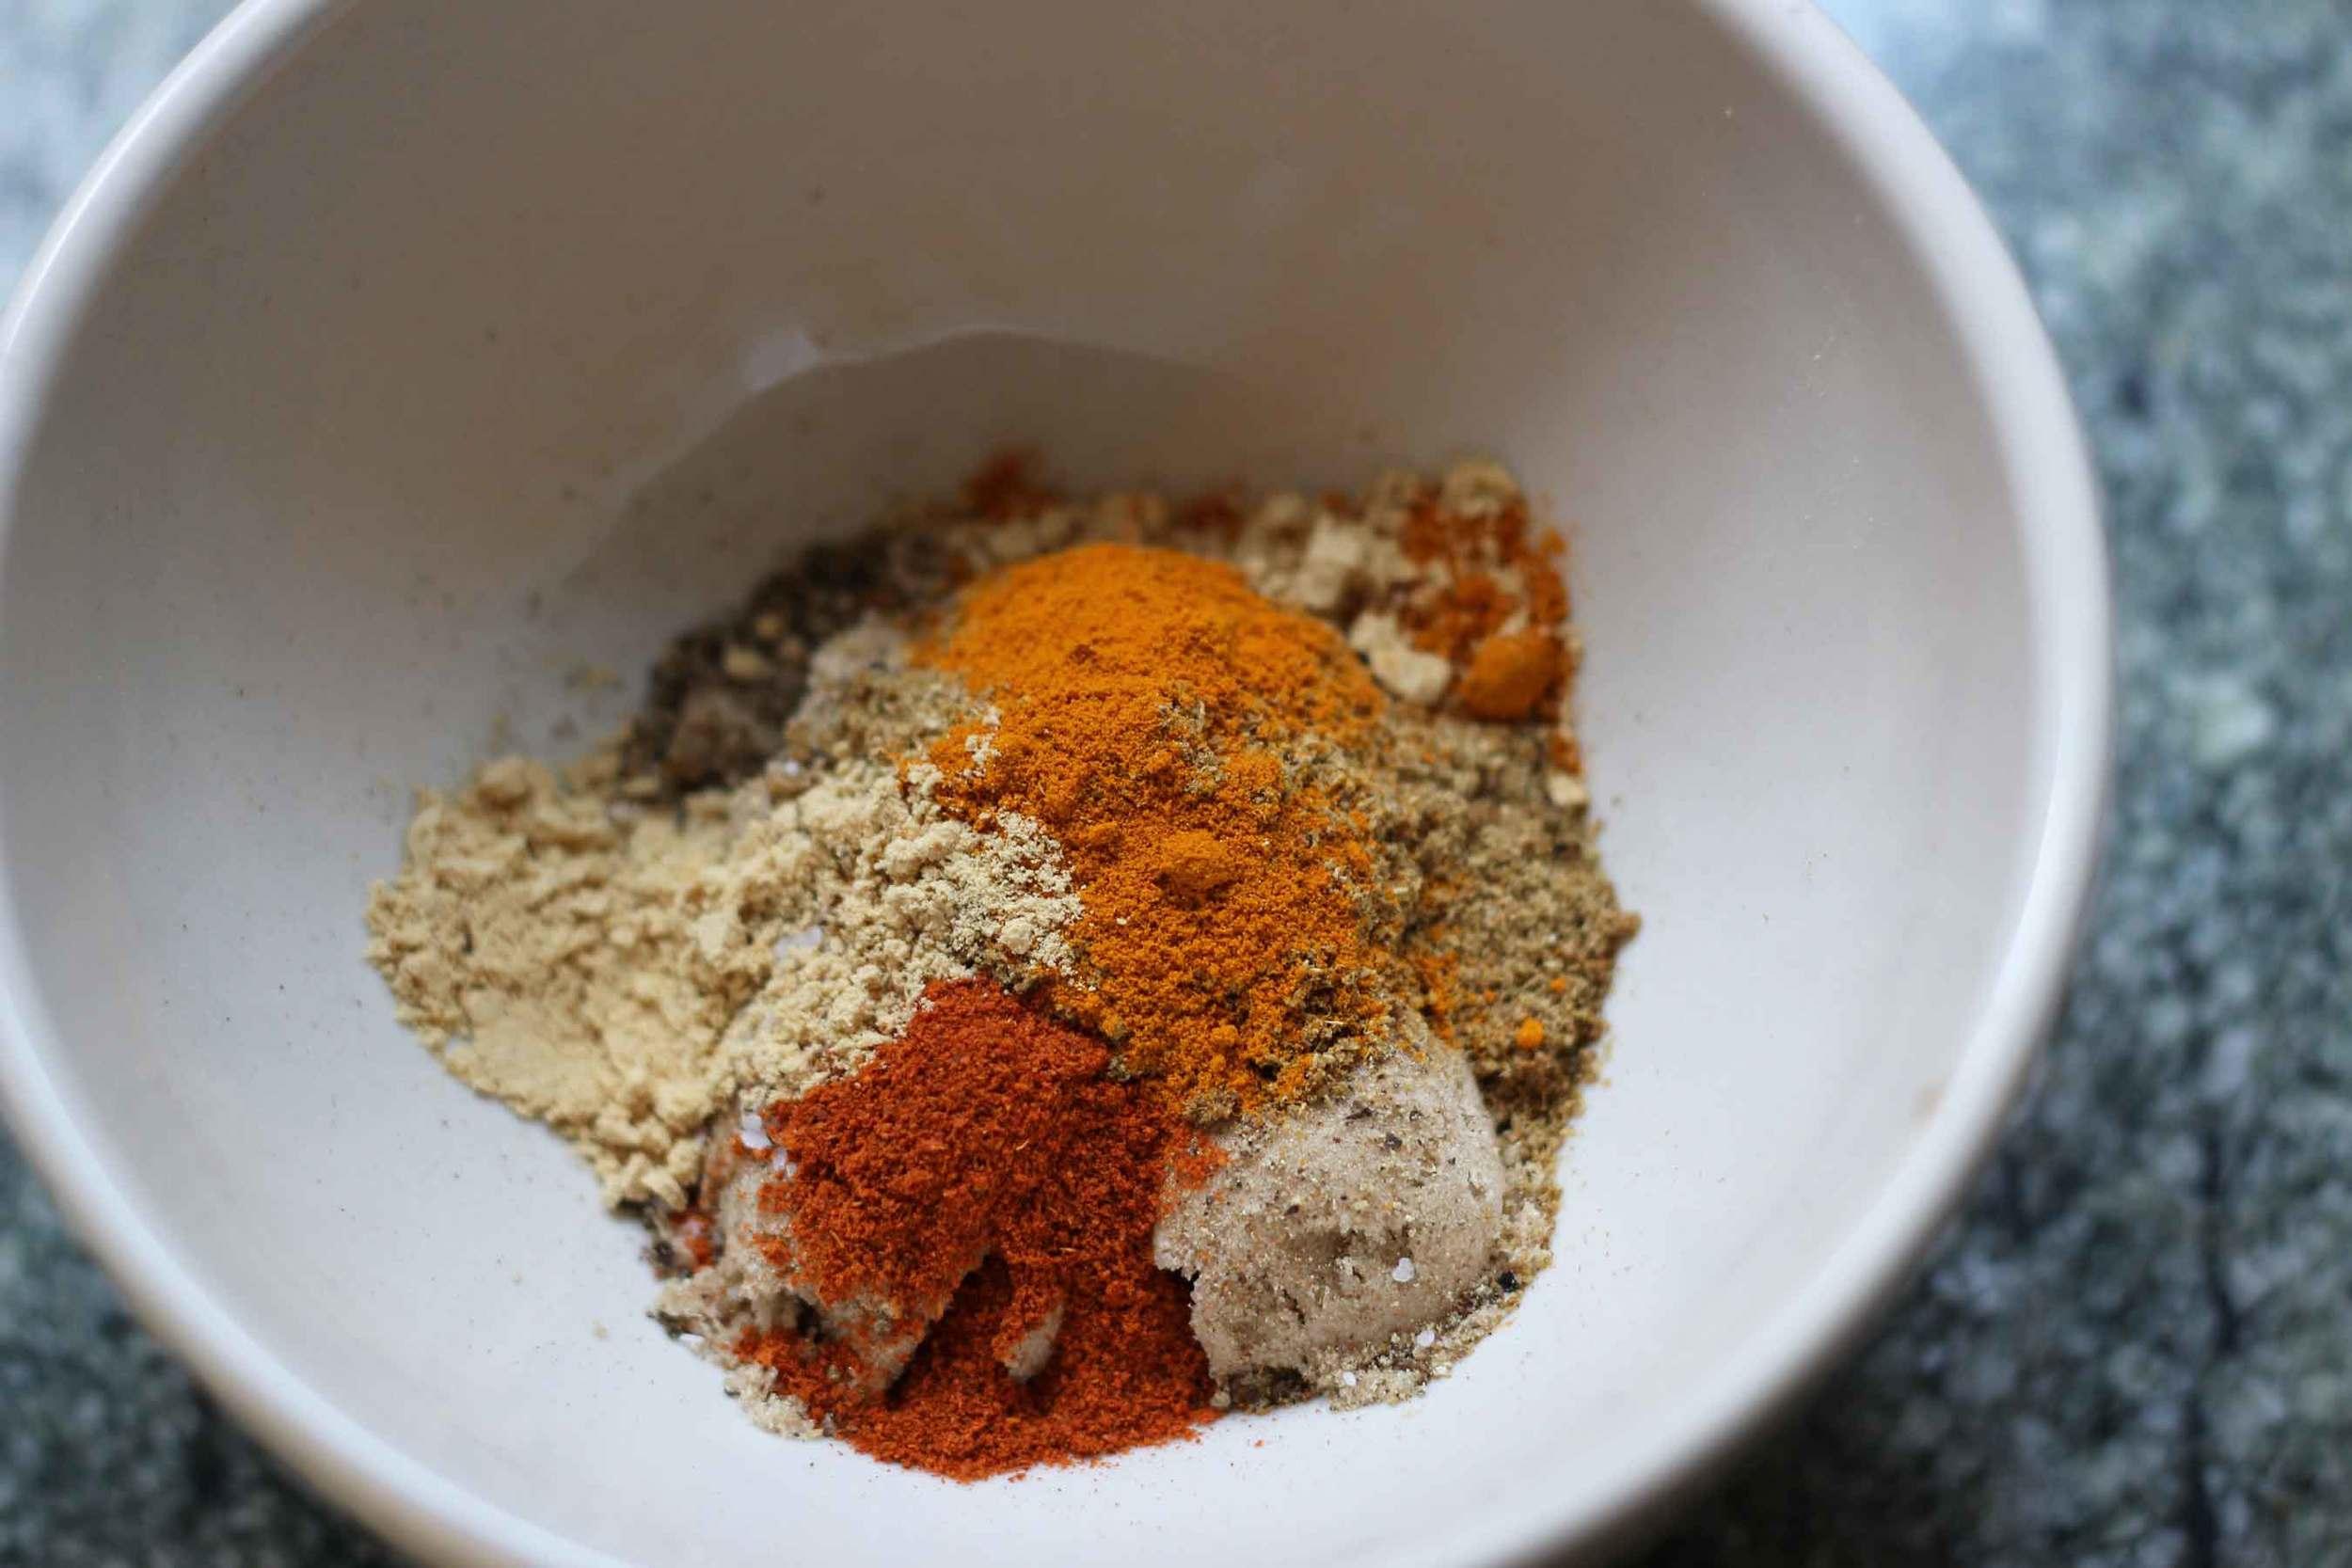 spice blend for sockeye salmon, recipe from Thread & Whisk